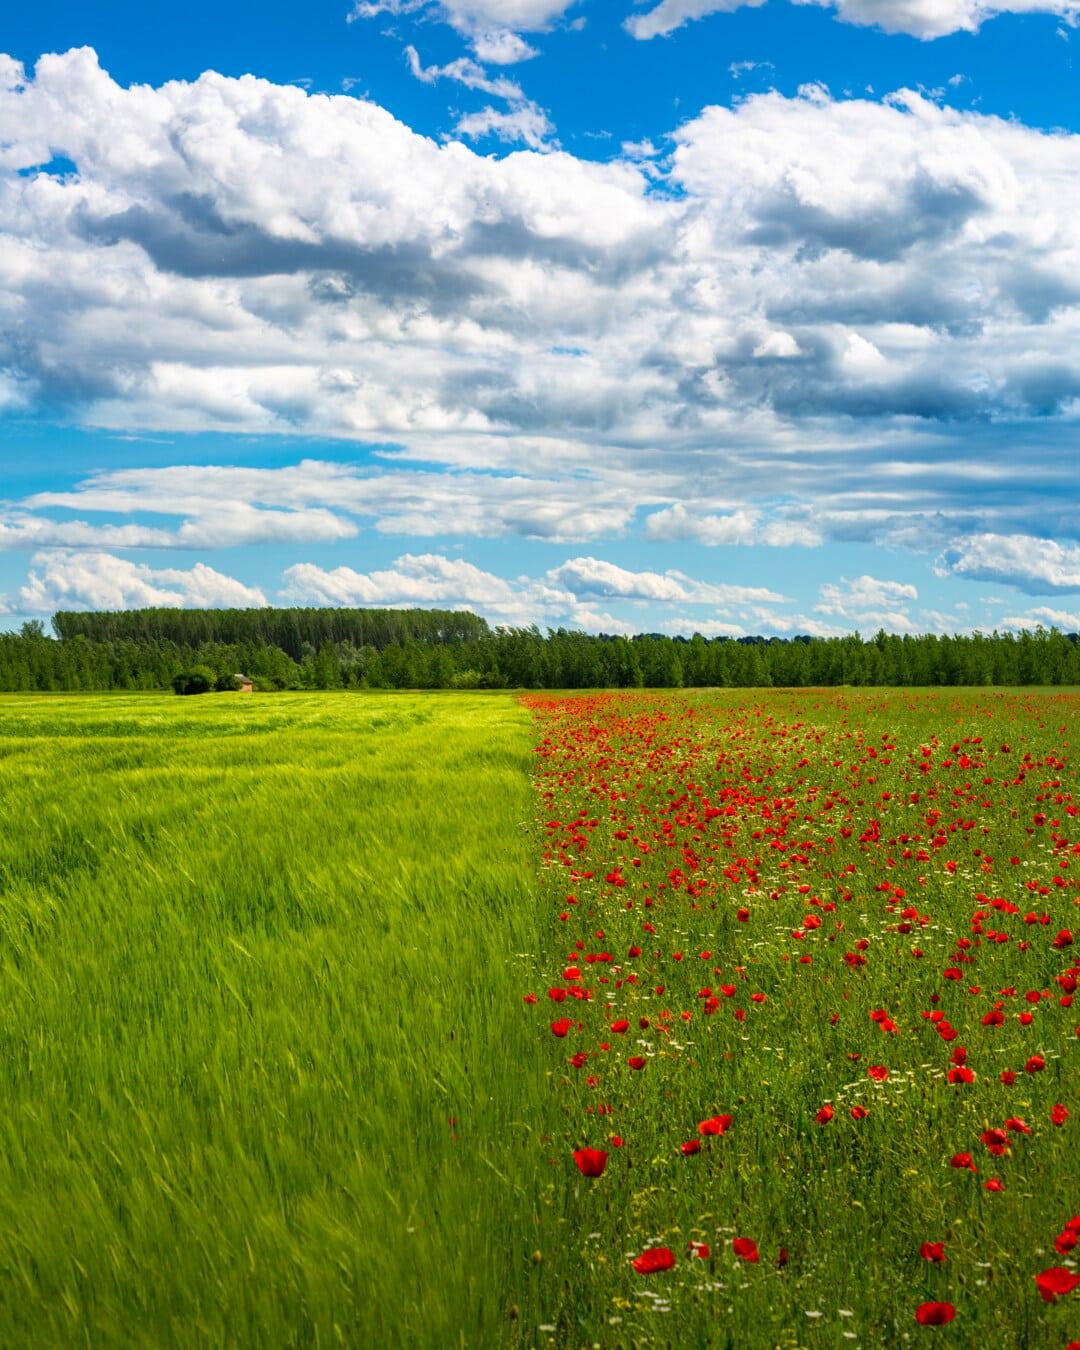 wheatfield, poppy, flowers, summer season, perspective, landscape, spring, grass, rural, field